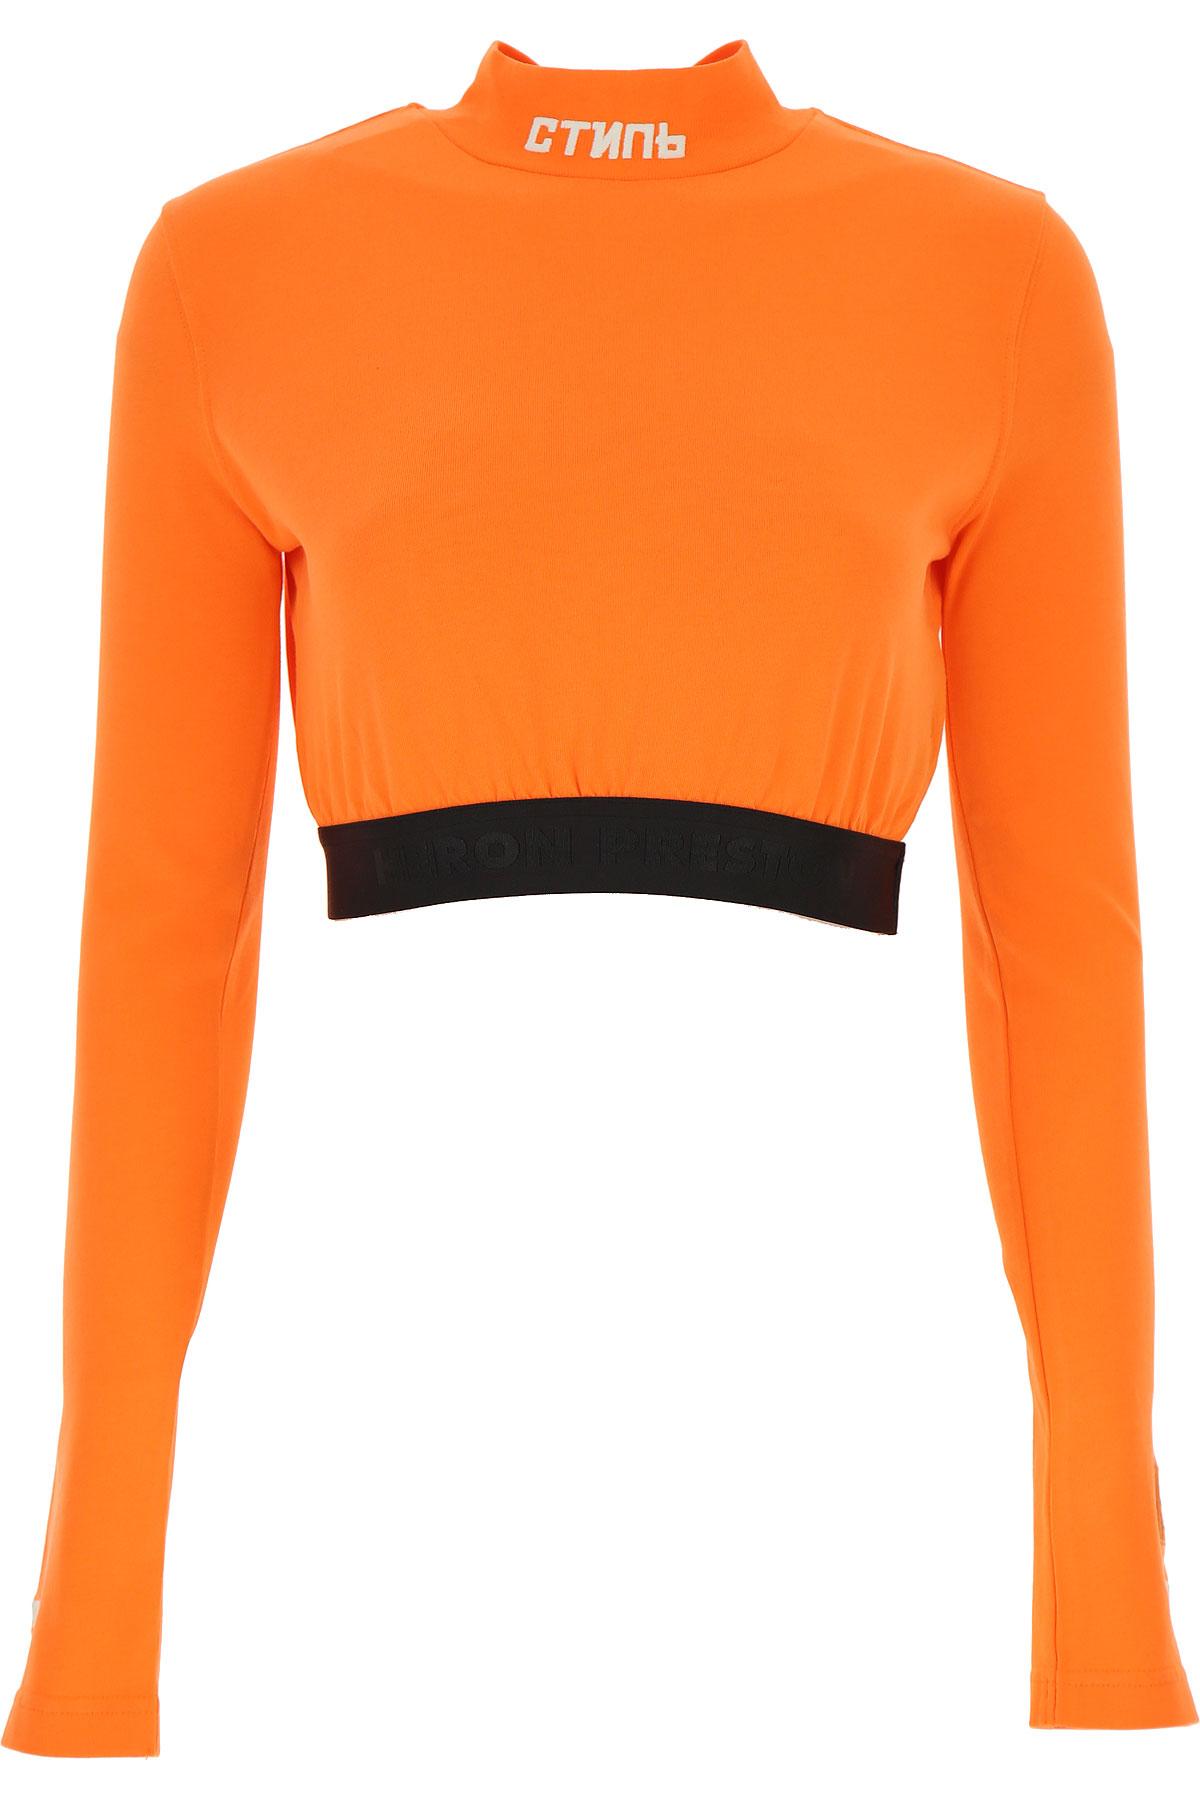 Heron Preston Top for Women On Sale, Orange, Cotton, 2019, 2 4 6